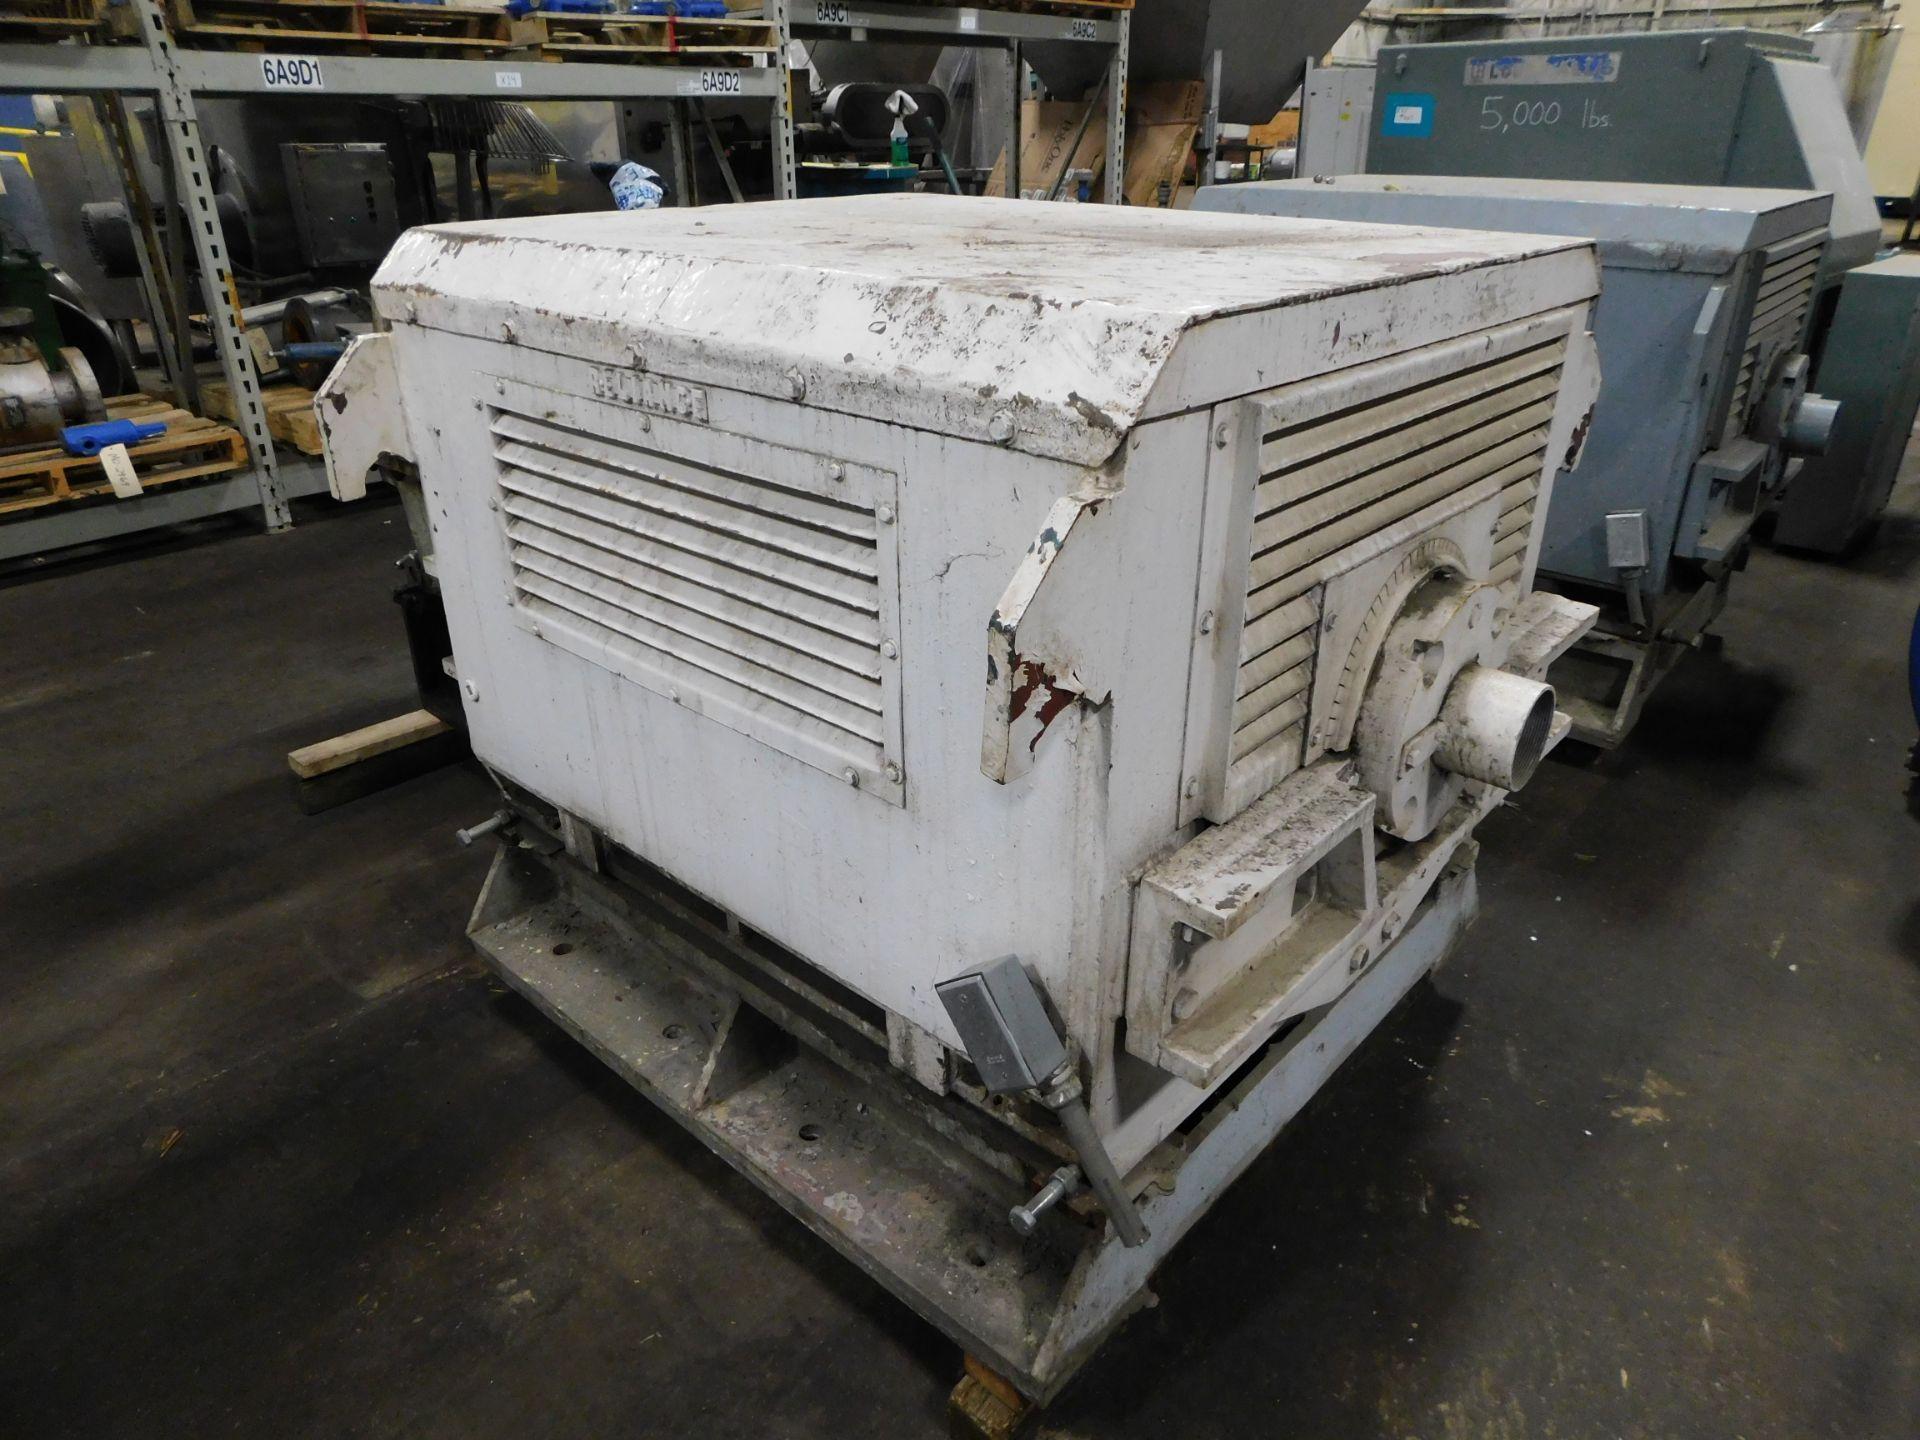 Reliance AC Duty Master Motor. 900 HP. 3 Ph. 60 Hz. 4160 V. 1789 RPM. 6809S. Type P. - Image 3 of 7